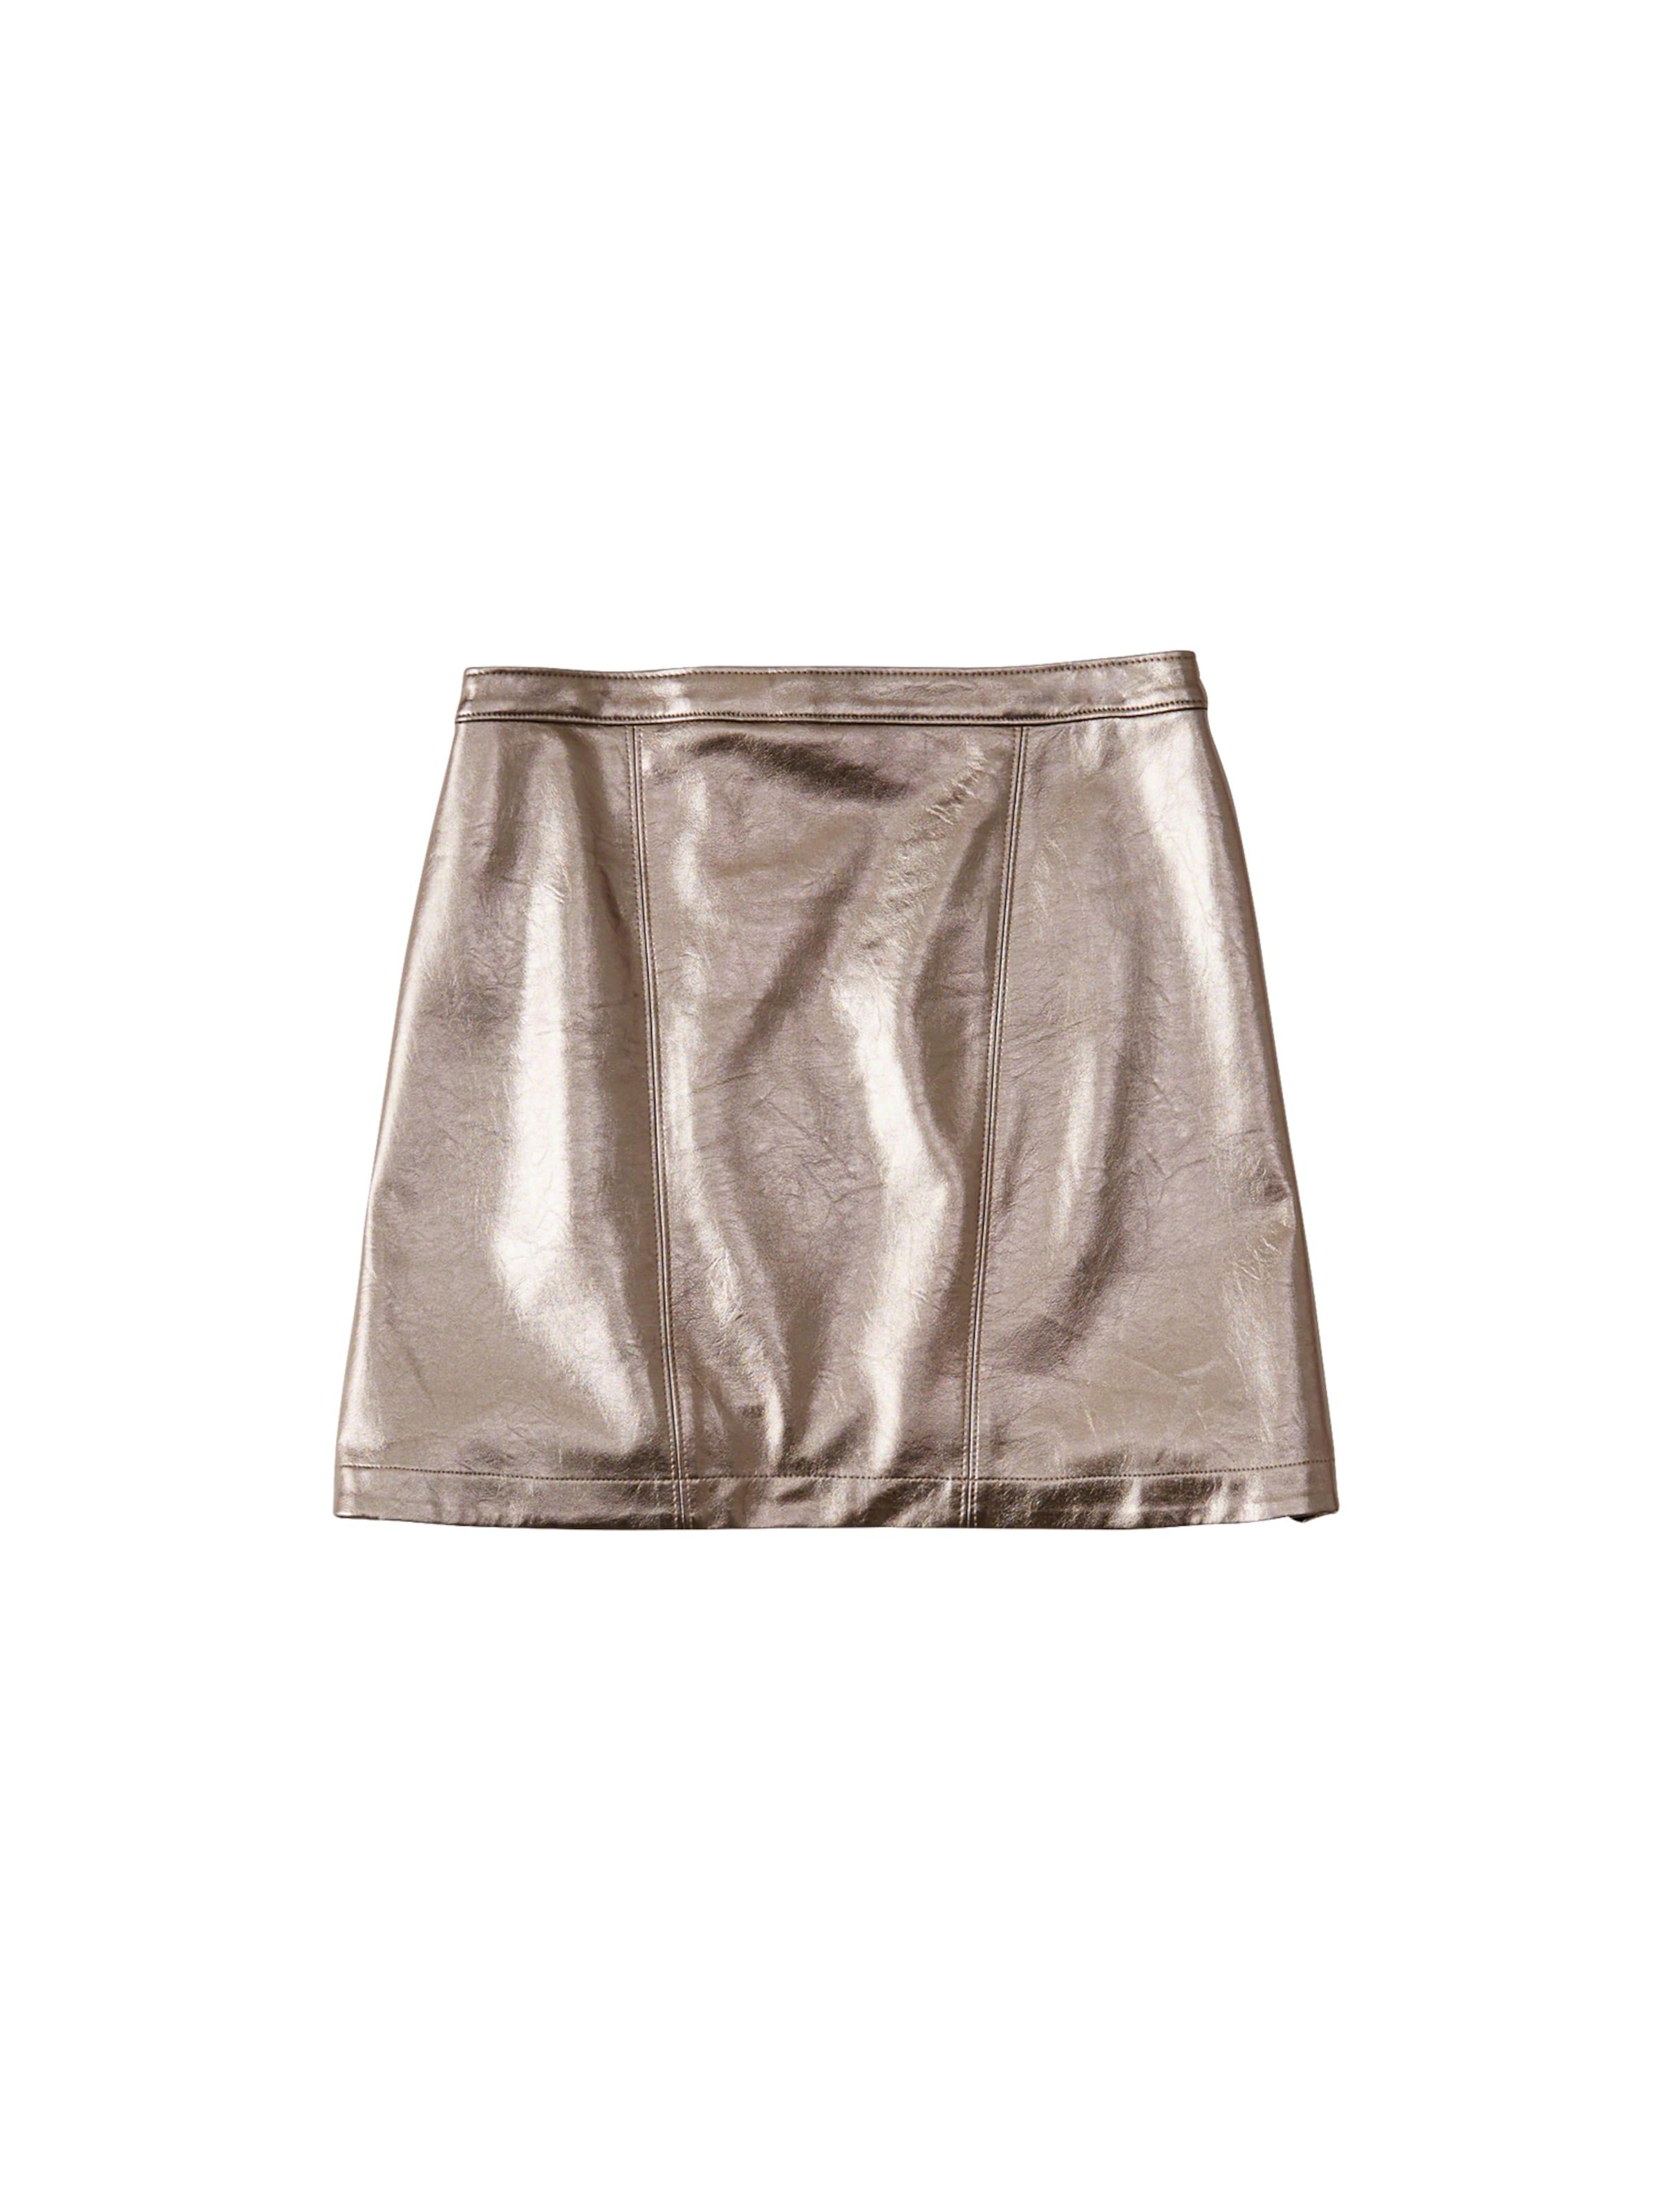 metallic Mini' Jupe En Argent Abercrombieamp; Fitch 'xm18 mNO8n0vw